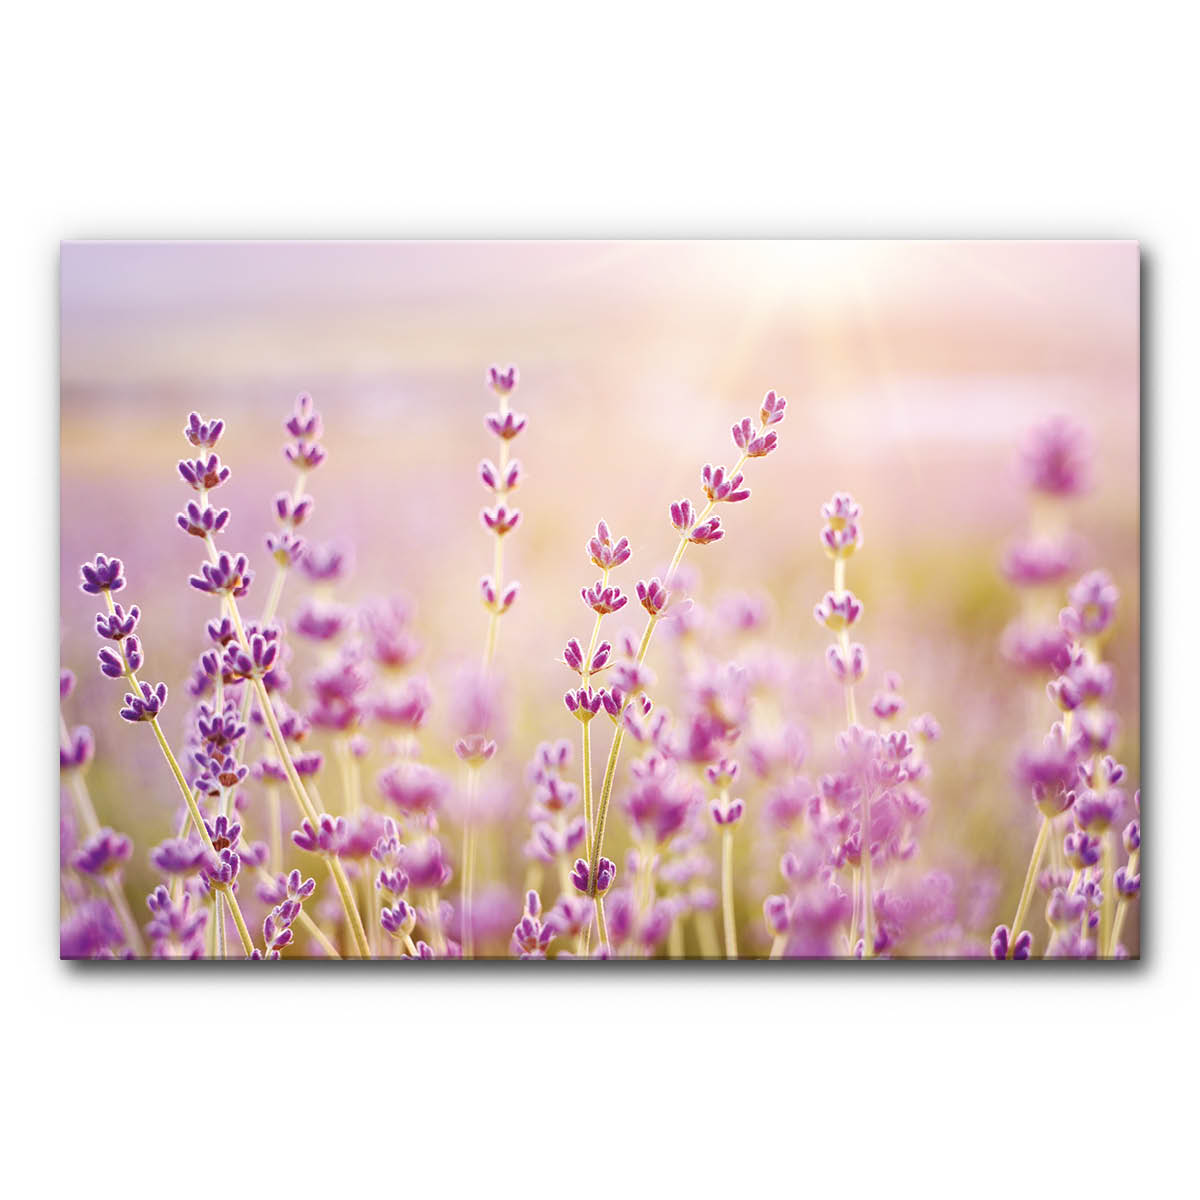 Schallabsorber Bild Lavendelfeld 3 im Format DIN A0